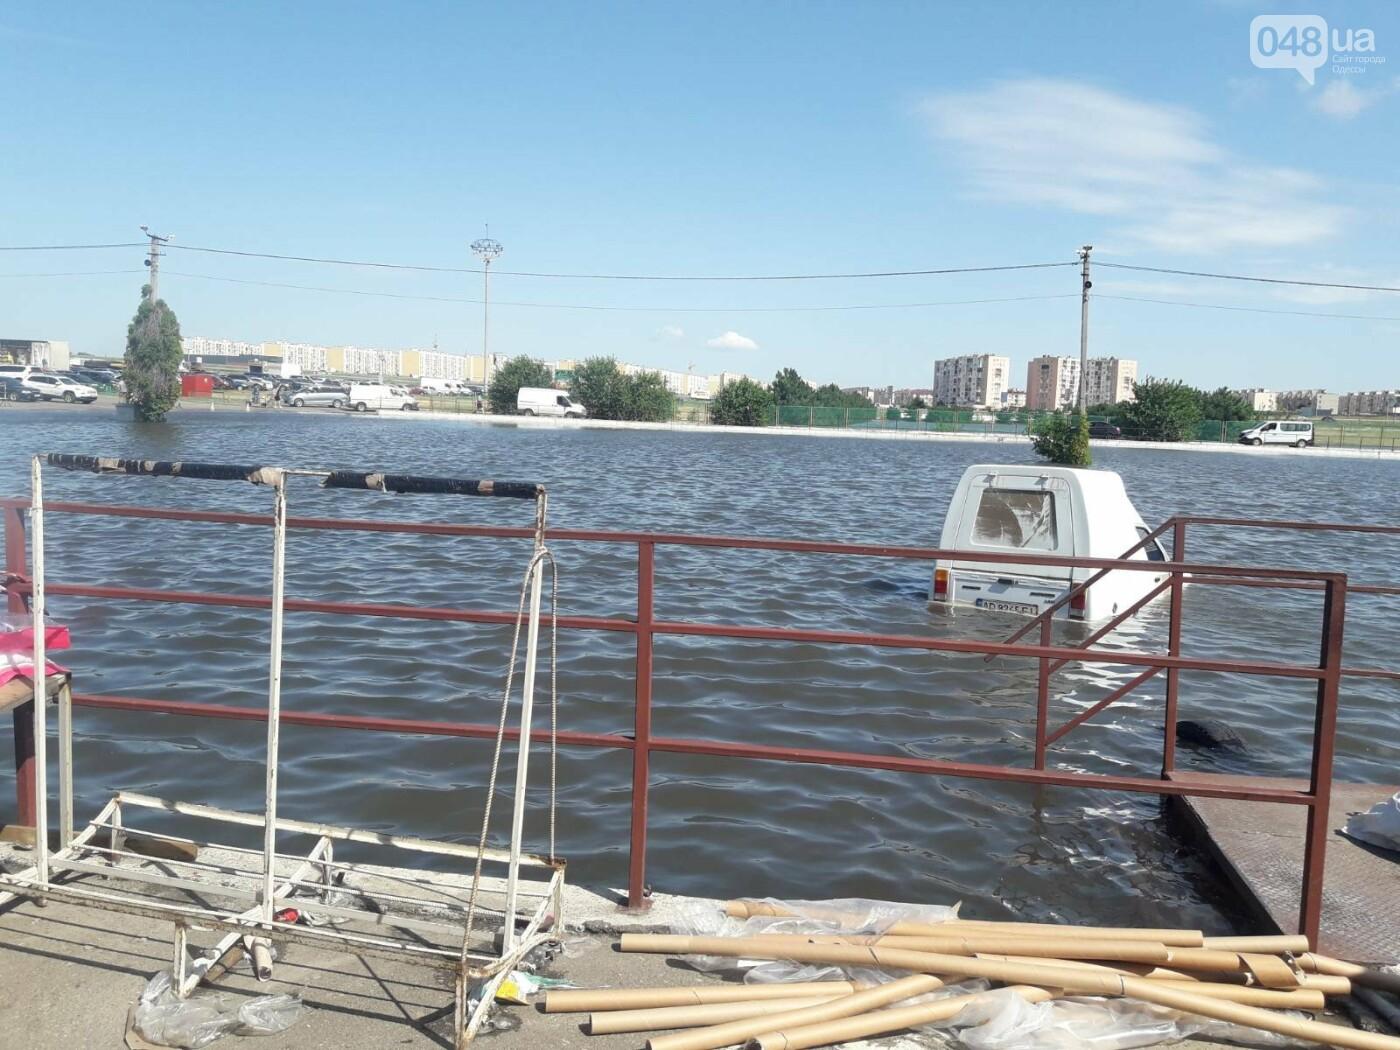 На промрынке 7км в Одессе образовалось море, - ФОТО, фото-15